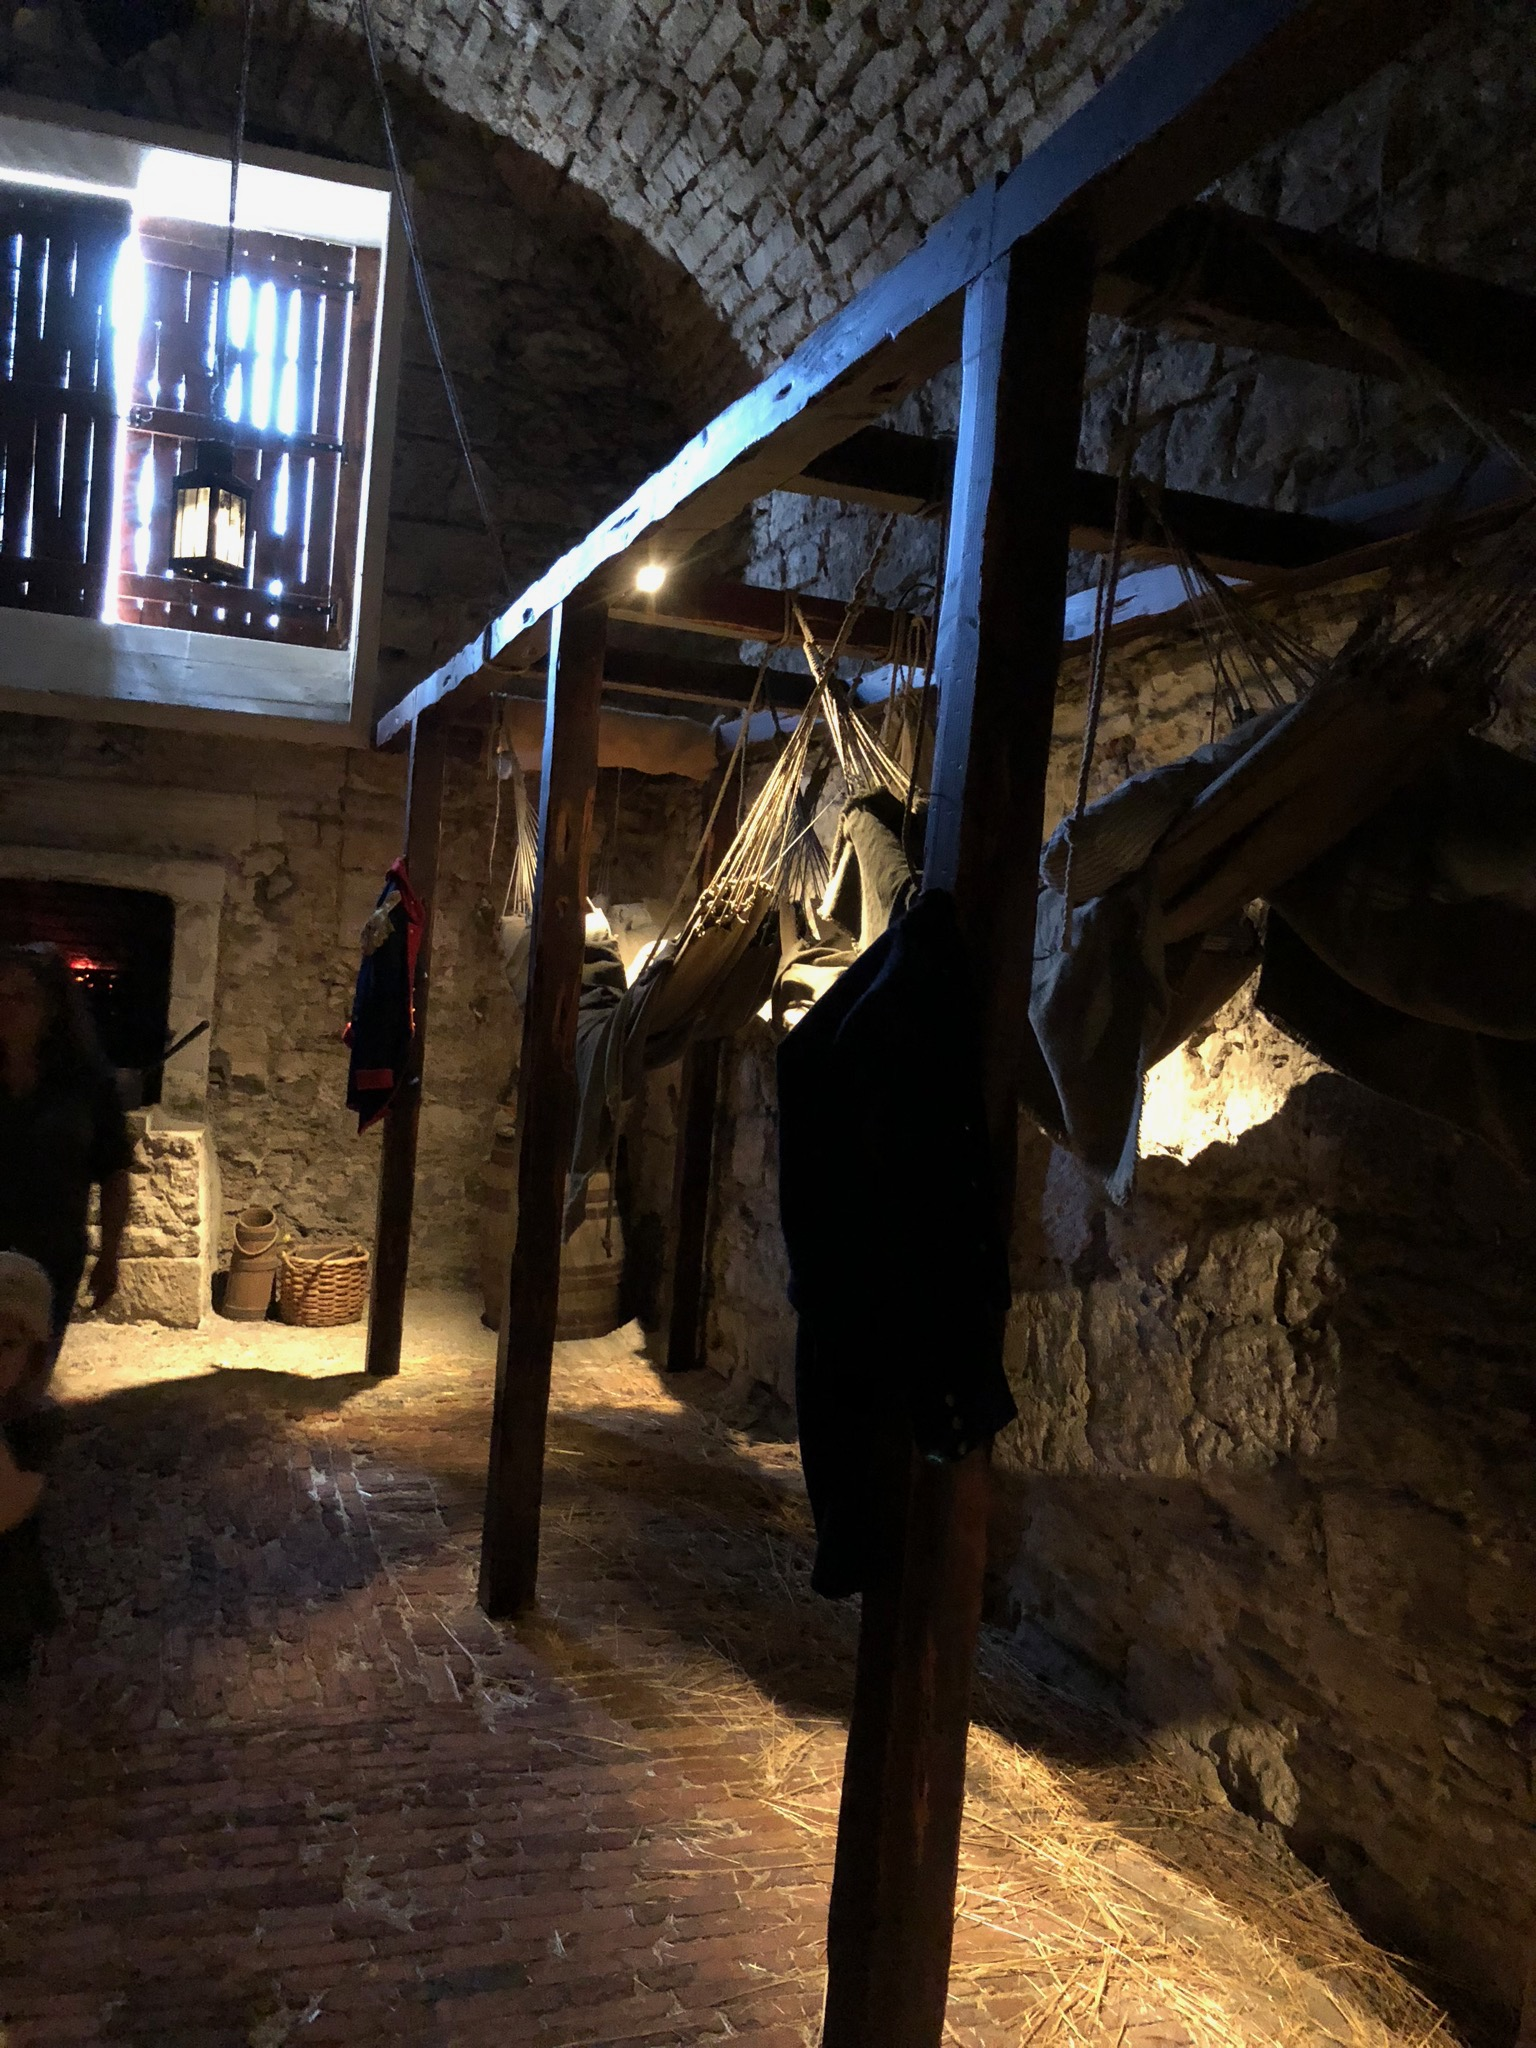 #prison, #dark, #crowded, #history, #conditions, #edinburgh, #castle